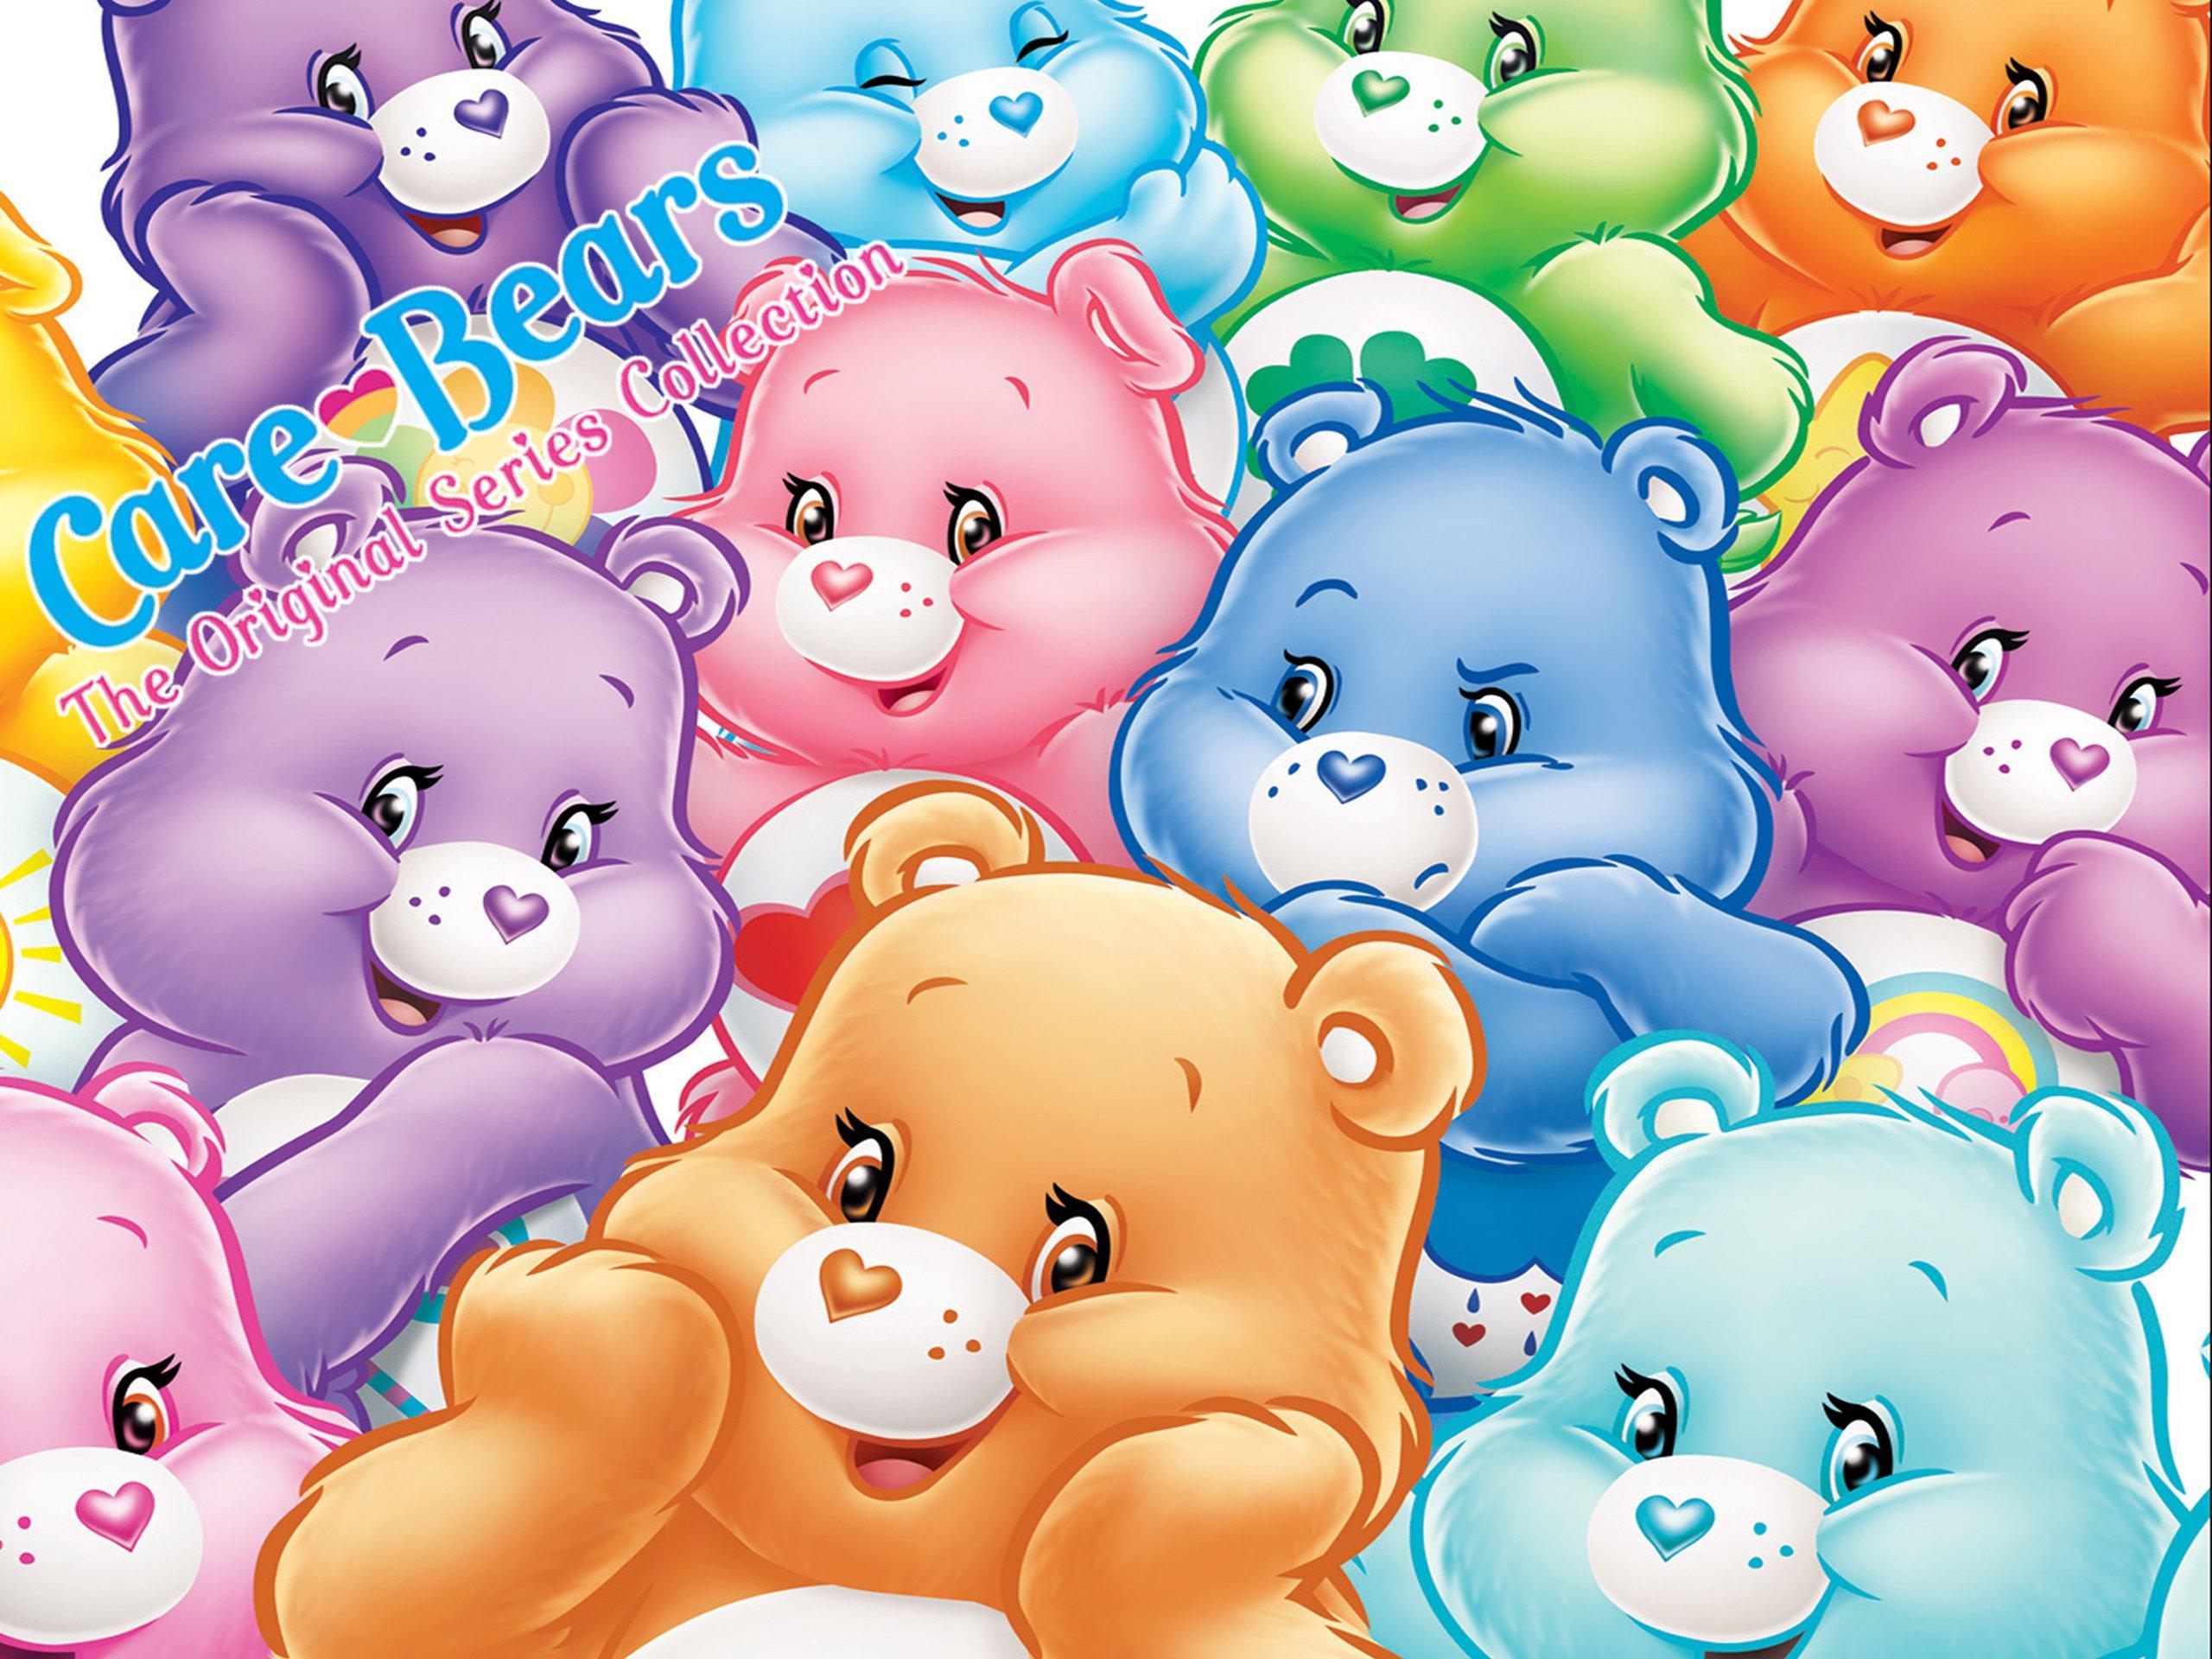 Care bears 80s clipart picture transparent download Amazon.com: Care Bears: Classic Series Season 1: Joseph Sherman ... picture transparent download